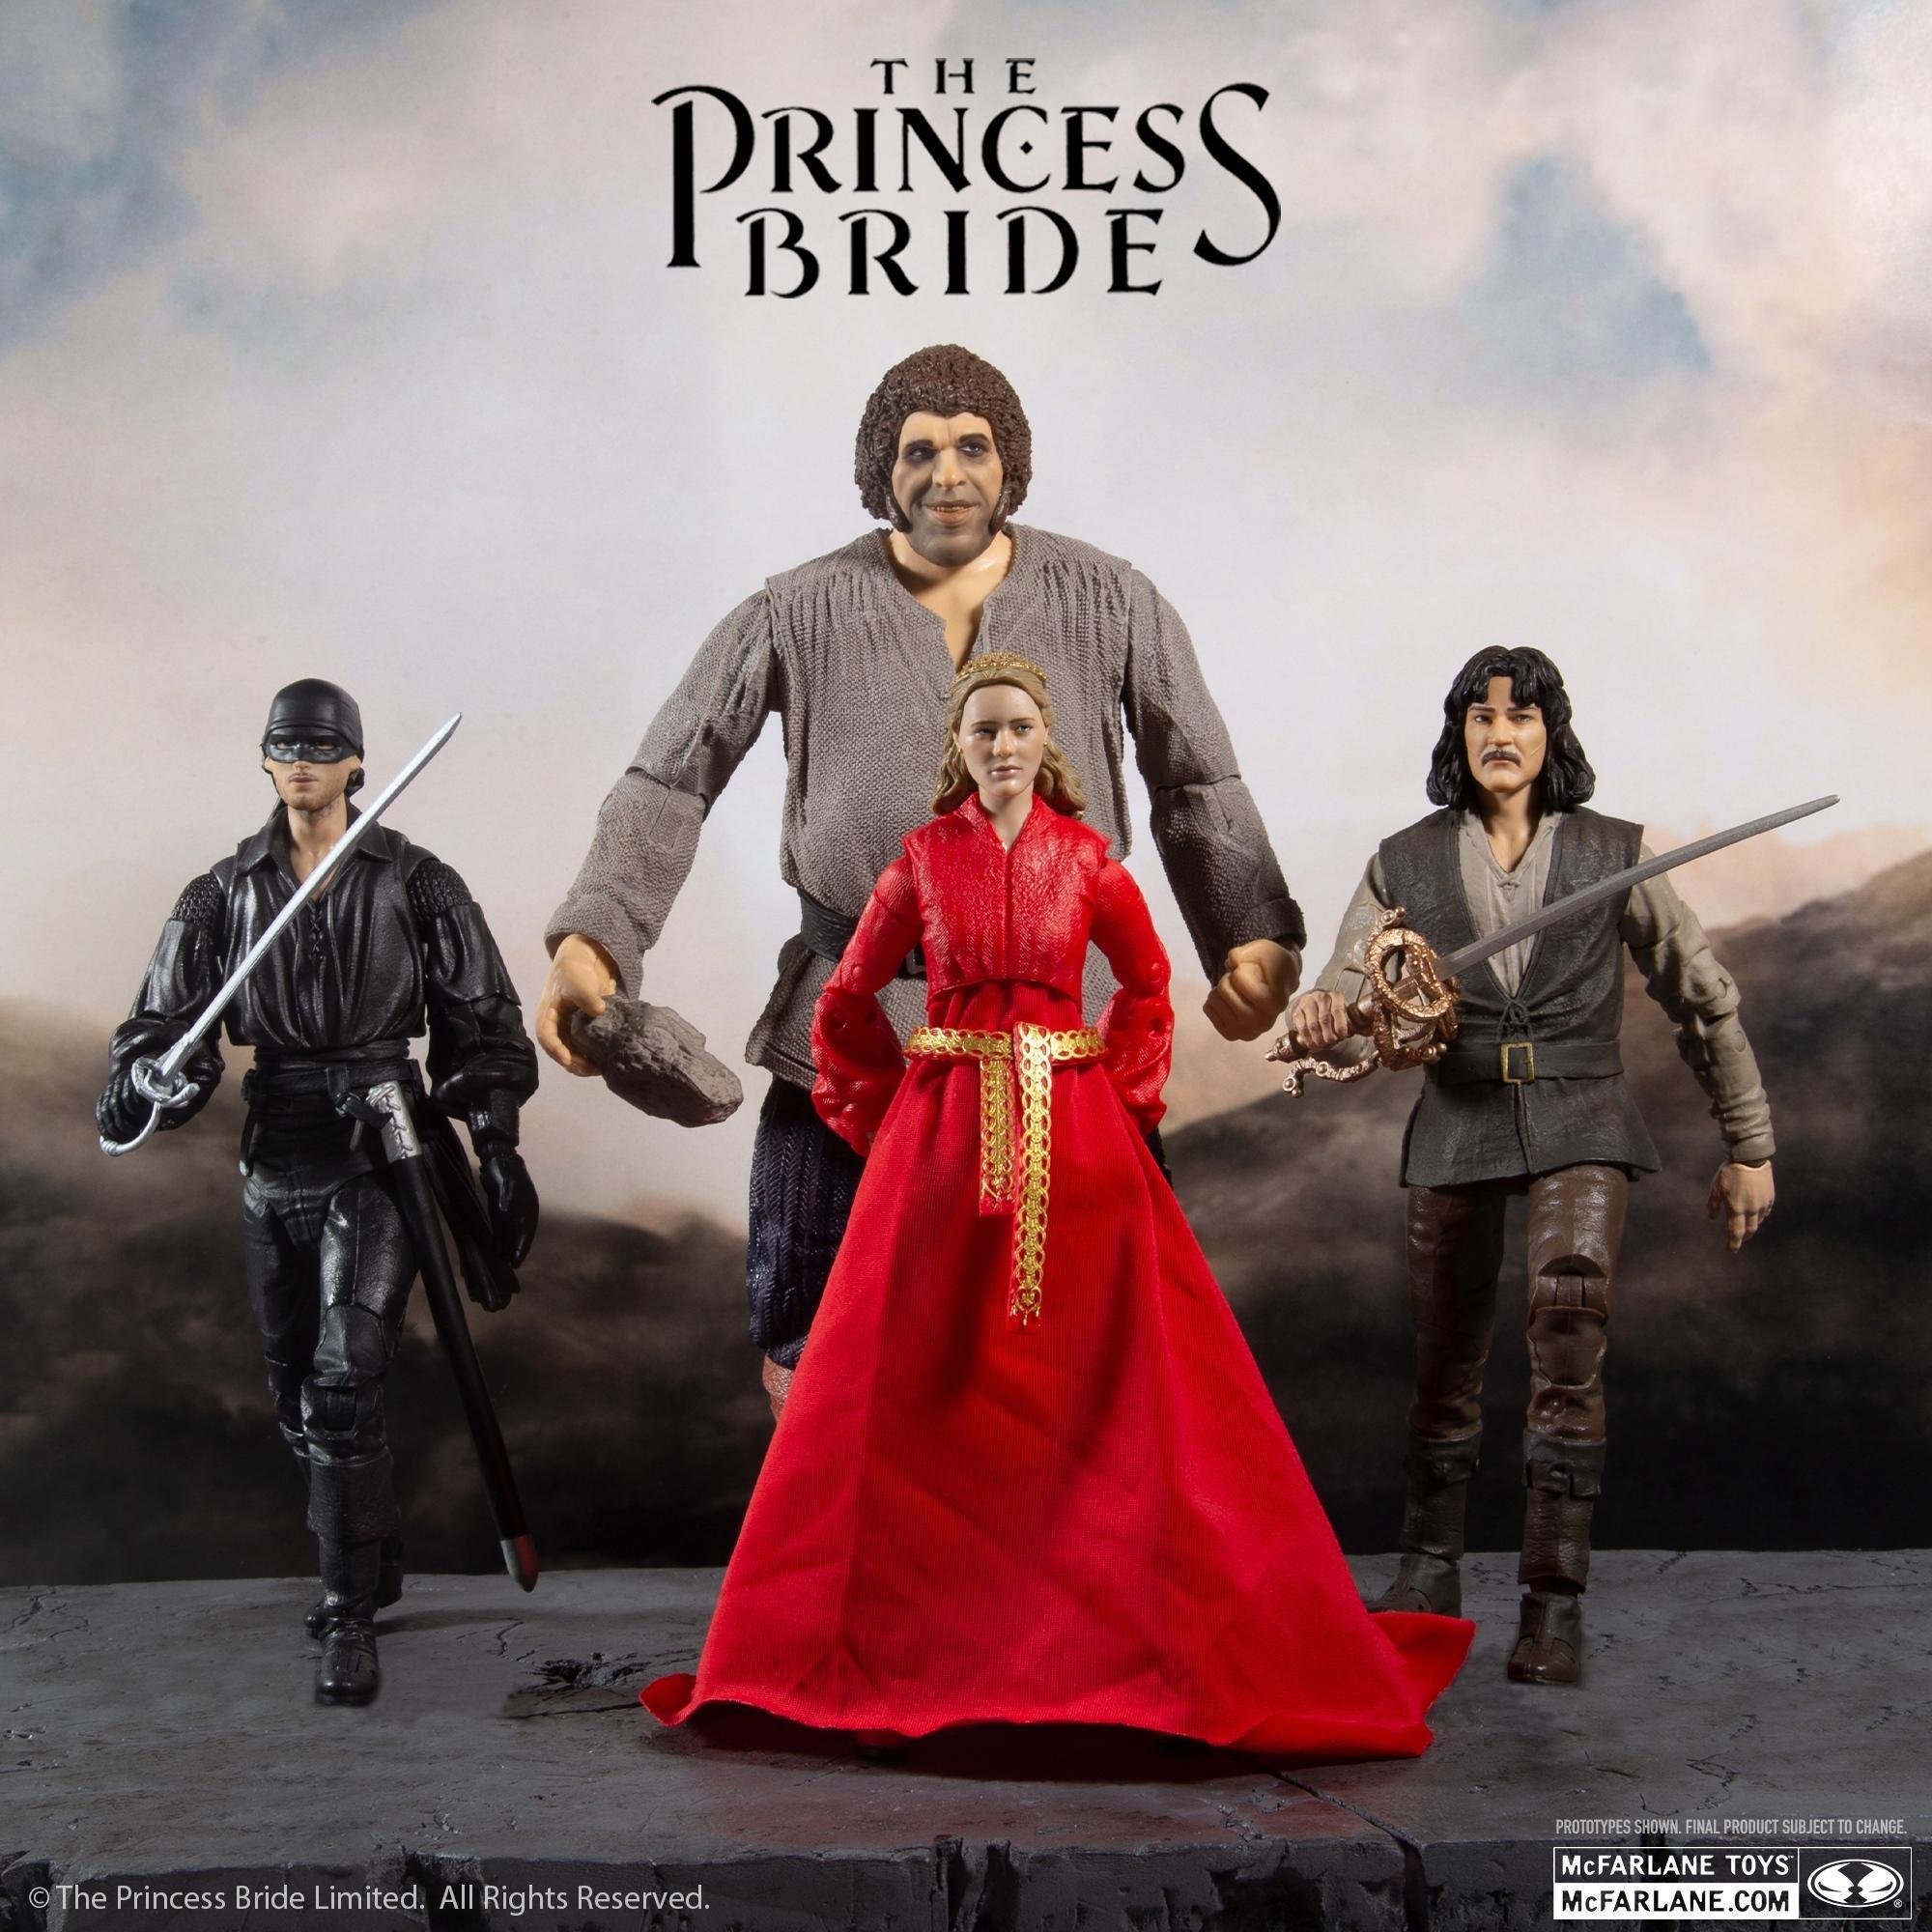 the-princess-bride-action-figures-mcfarlane-toys.jpg